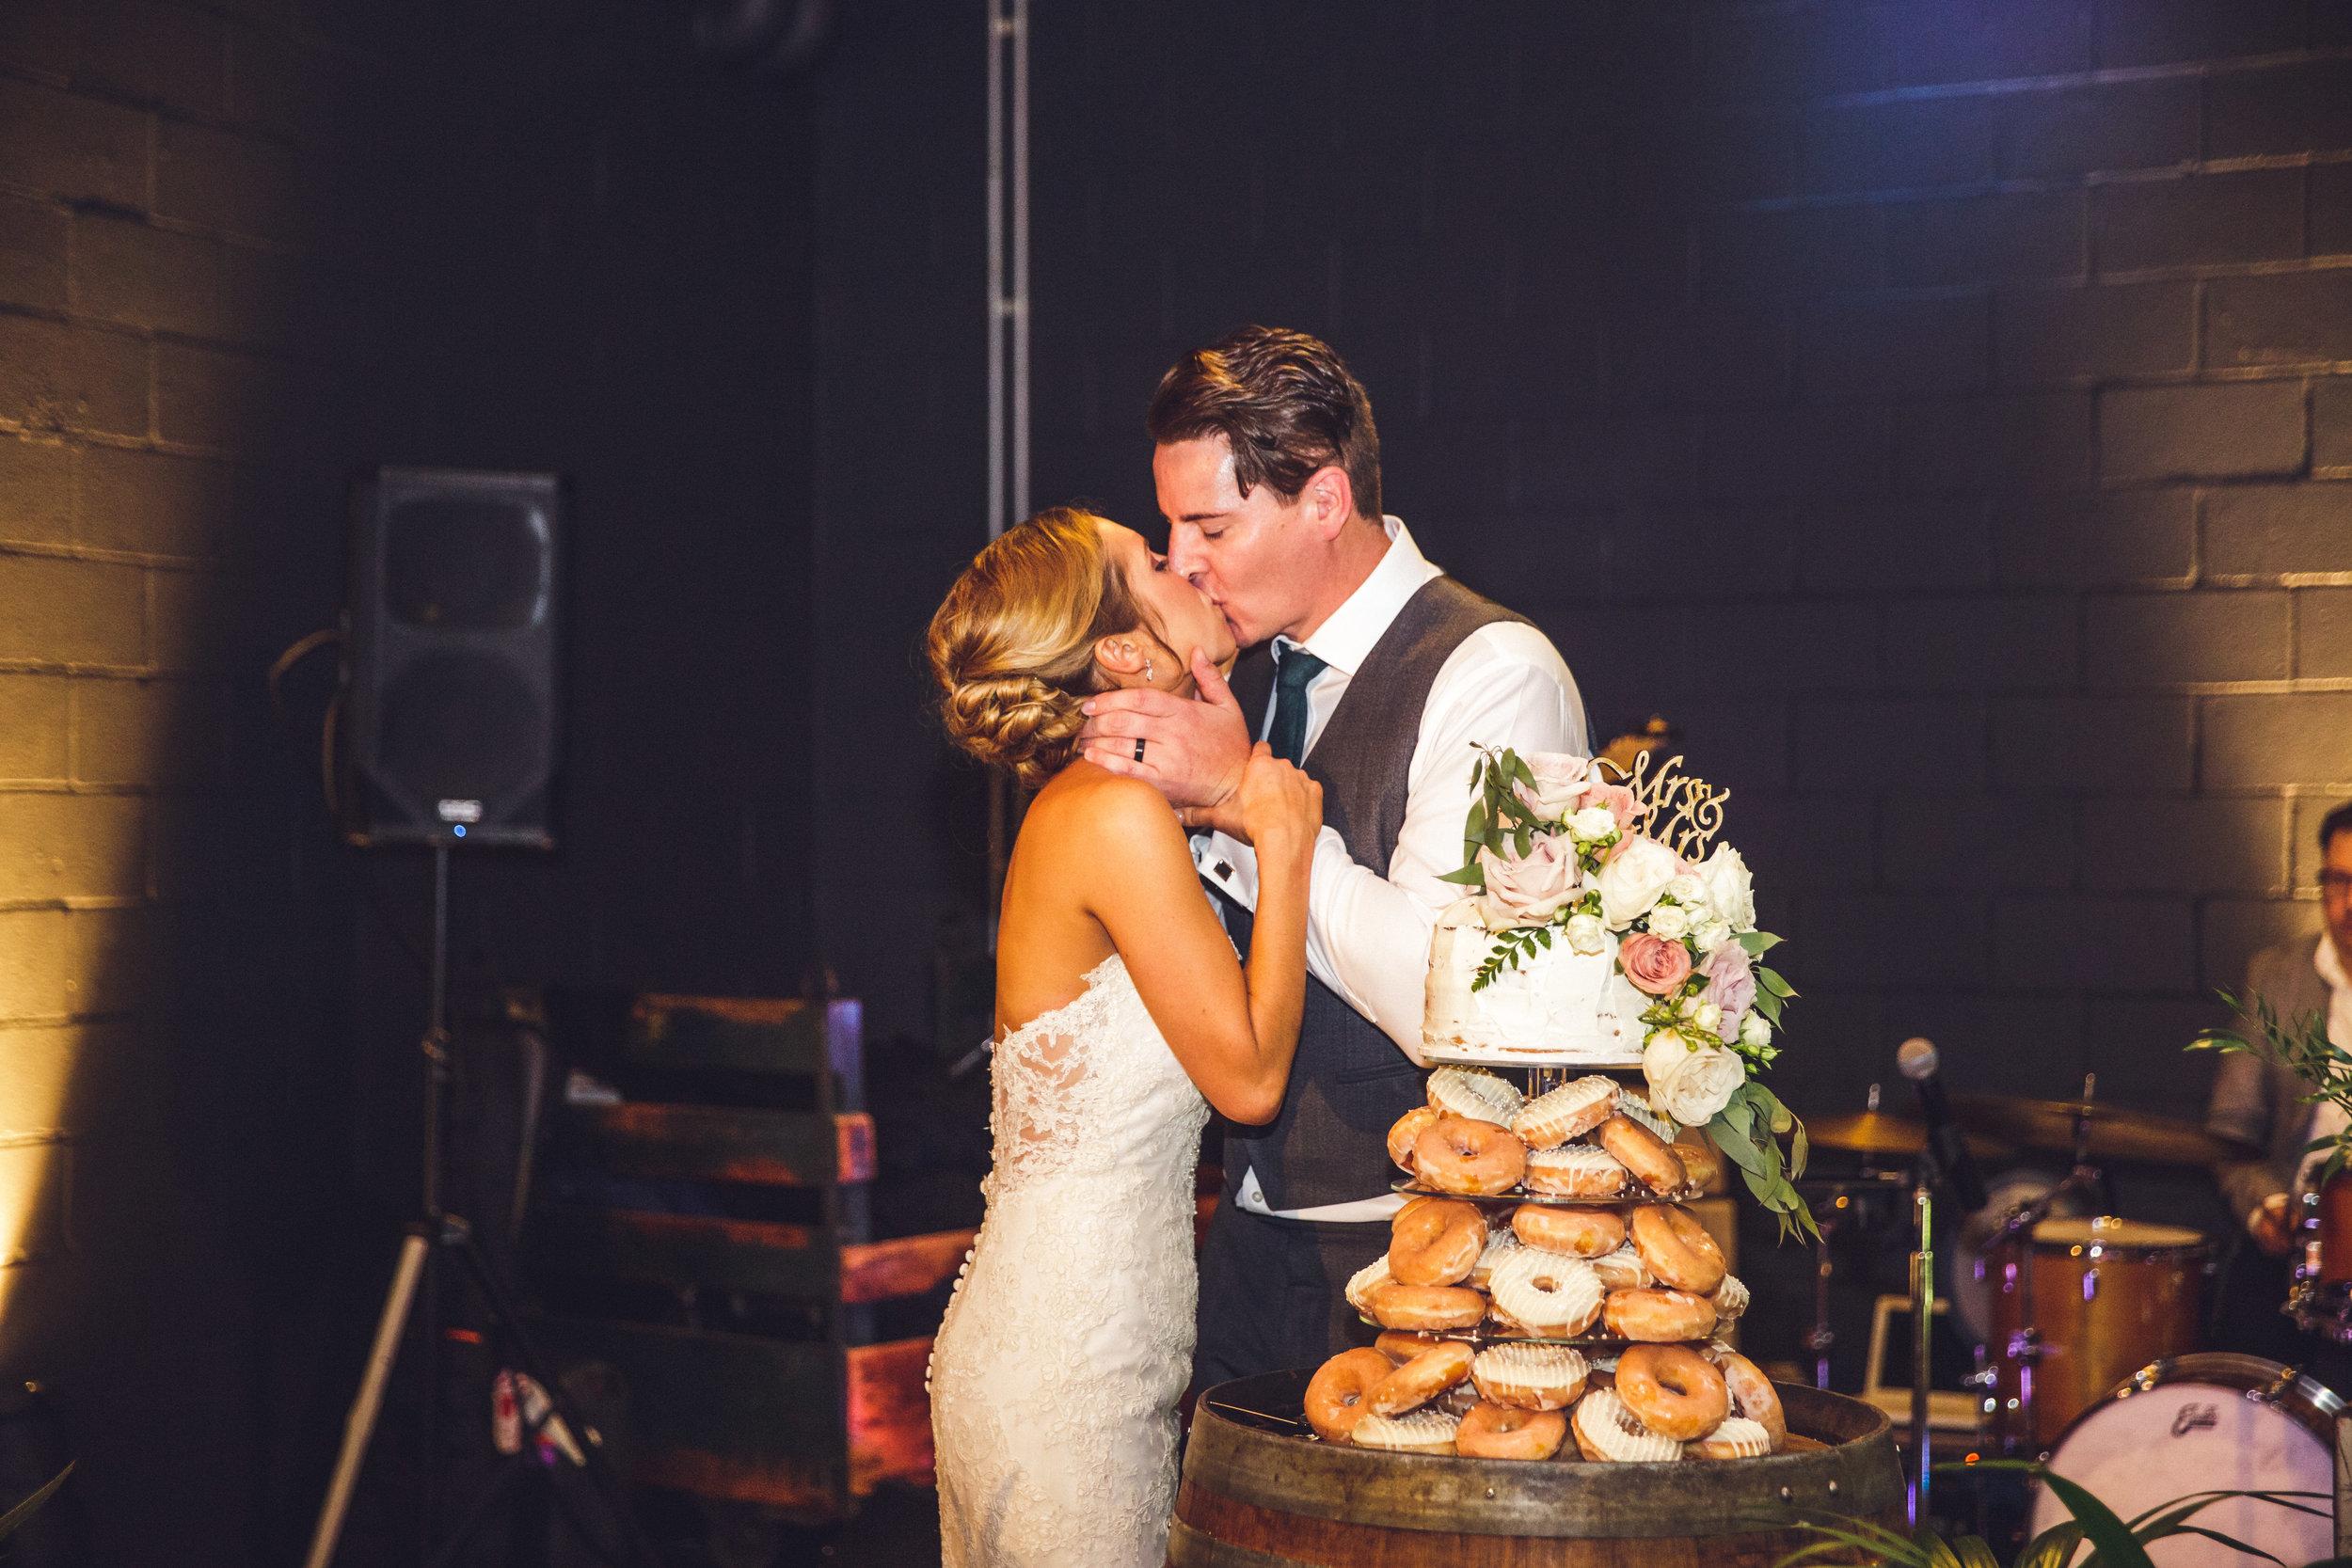 lightspace-brisbane-wedding-045.JPG